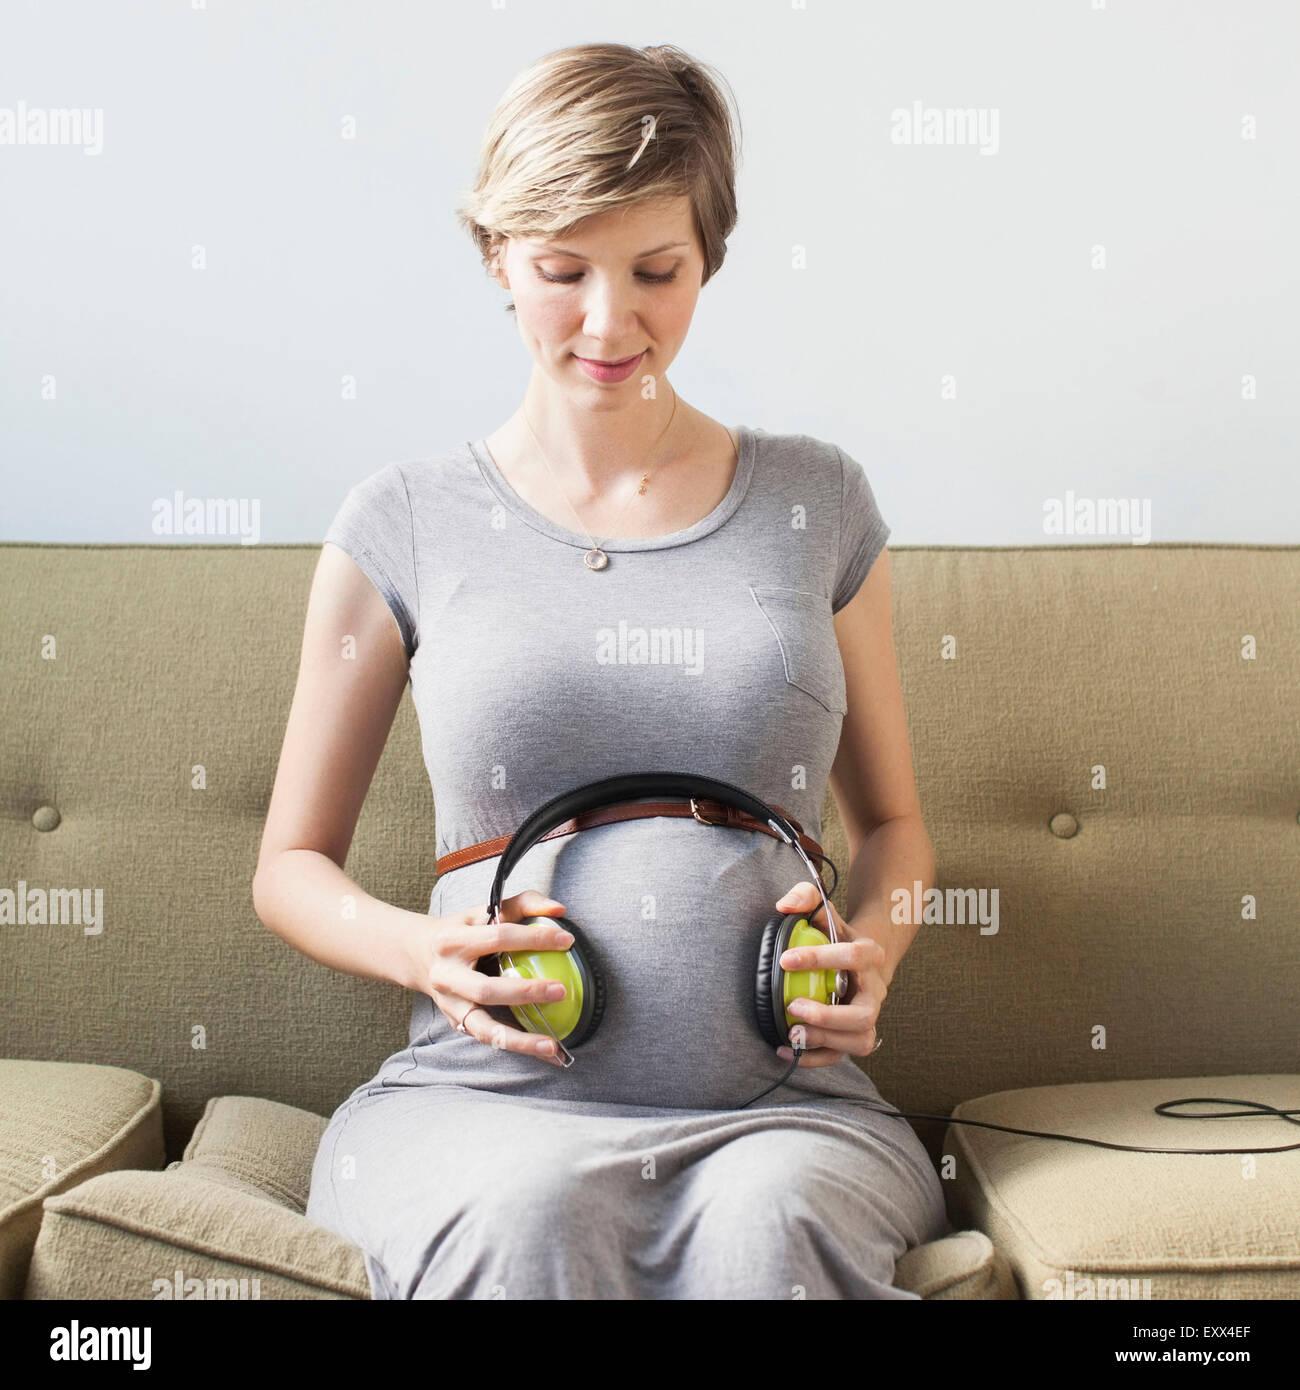 Pregnant woman holding casque sur l'abdomen Photo Stock